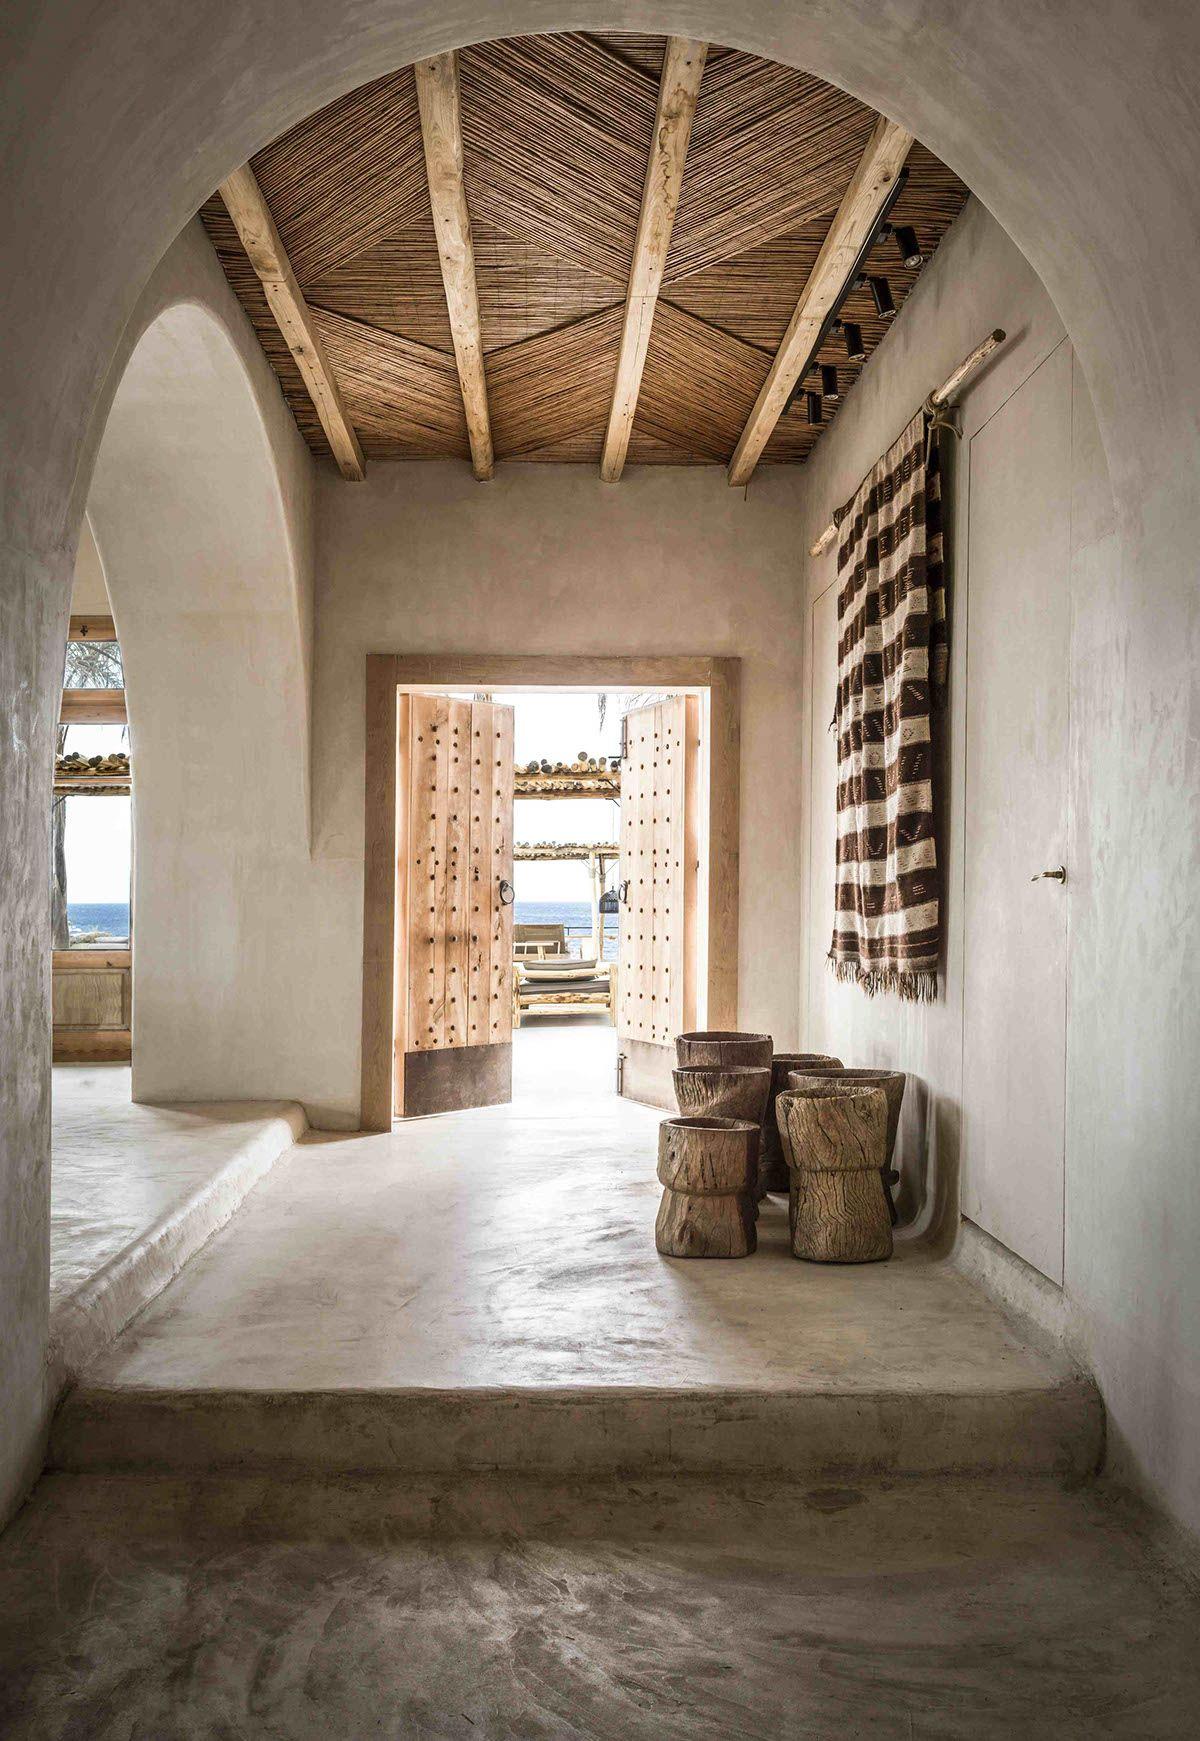 Ferienhaus innenarchitektur bohemian luxury at scorpios mykonos  haus  pinterest  haus